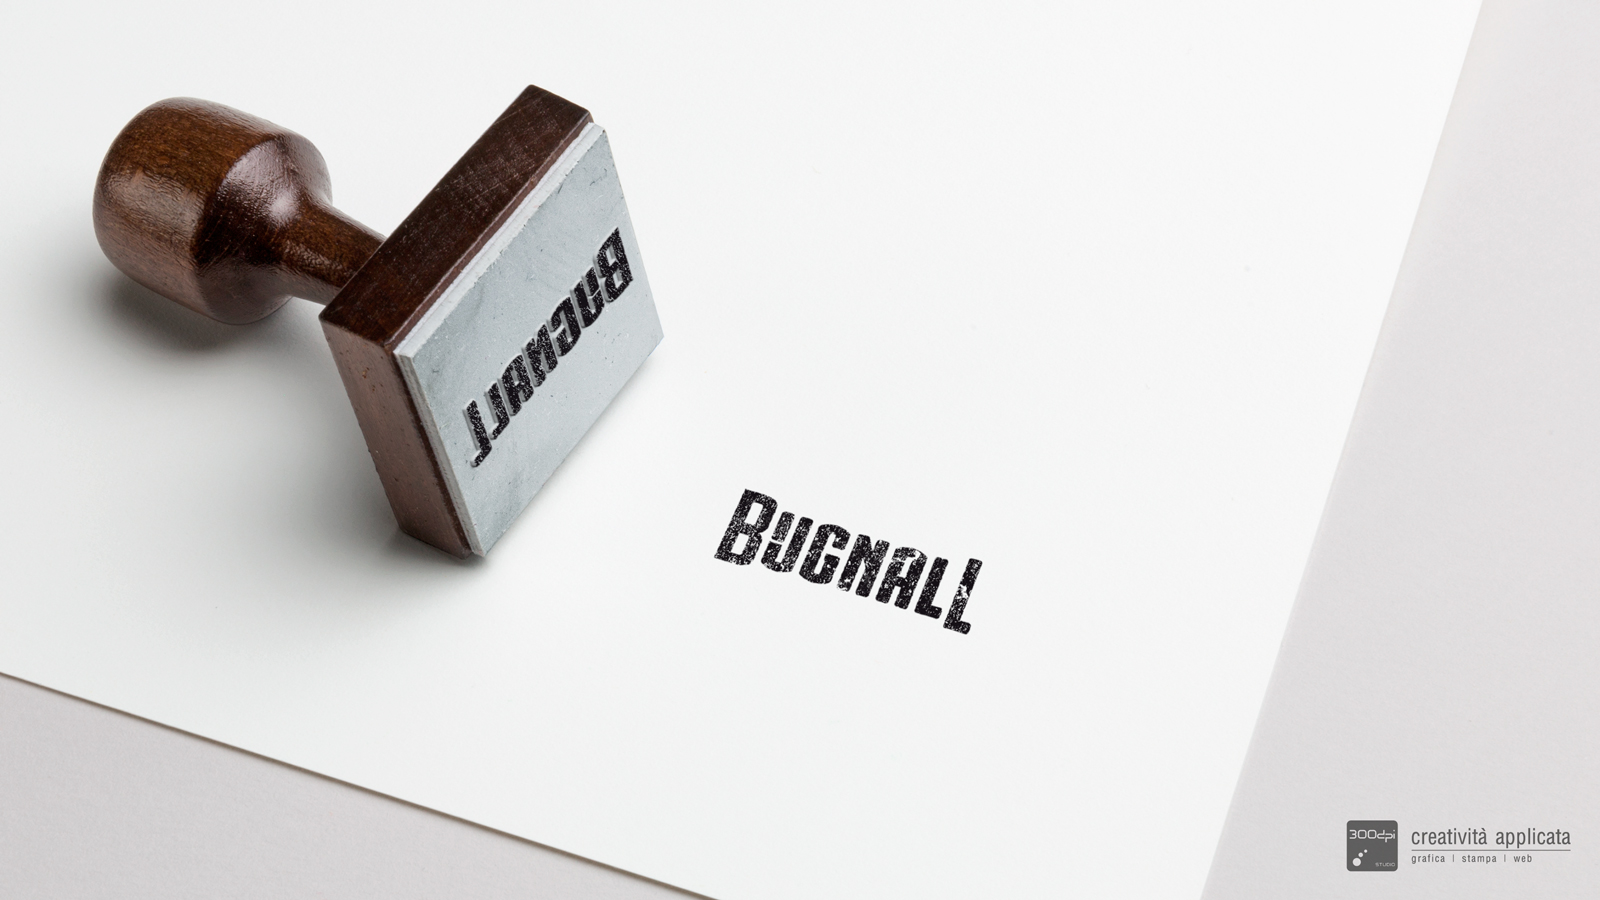 Bugnall Cimarelli logo - 300dpi STUDIO - Spoleto Rimini